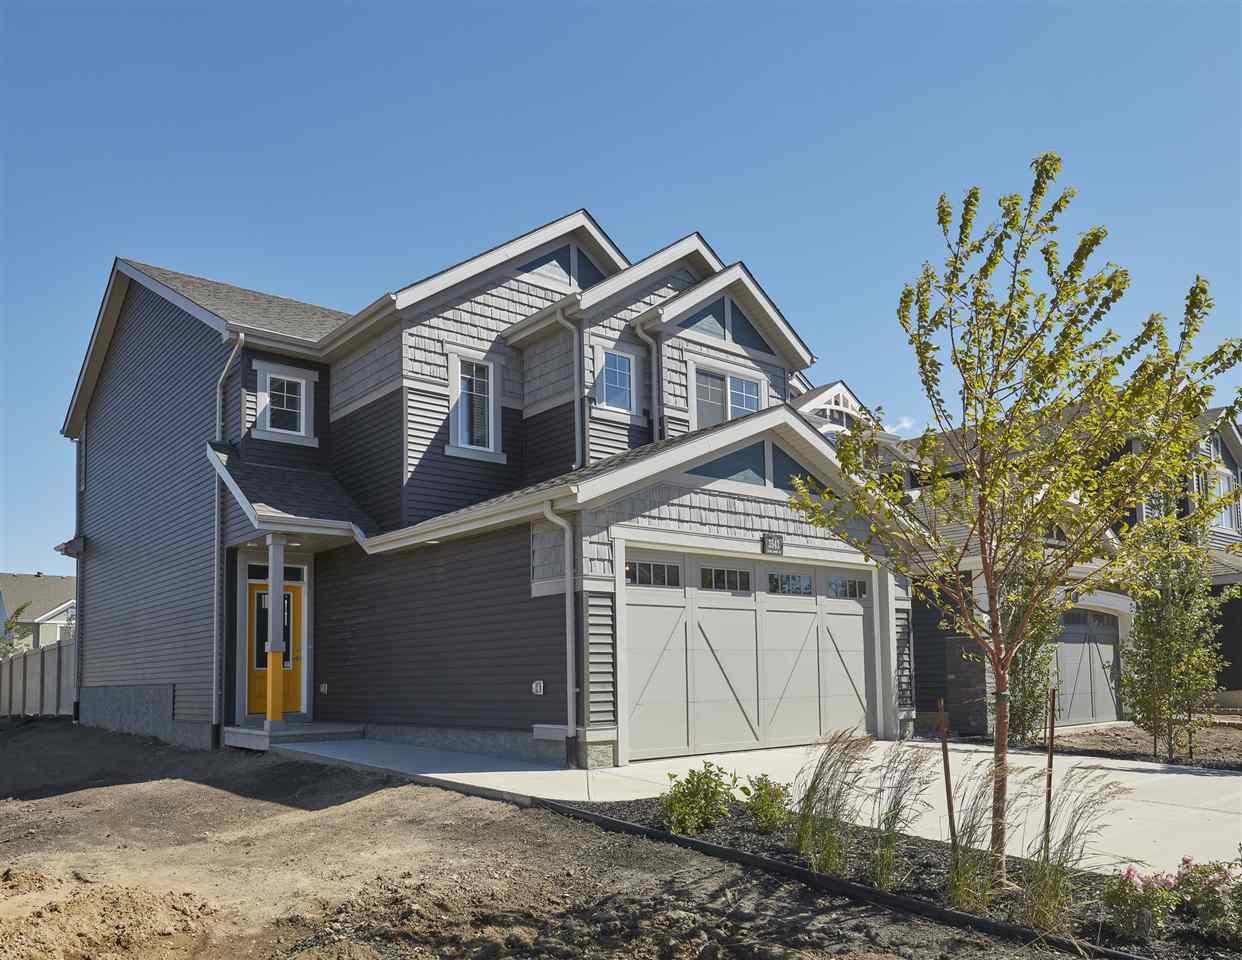 Main Photo: 3543 CHERRY Landing in Edmonton: Zone 53 House for sale : MLS®# E4186668